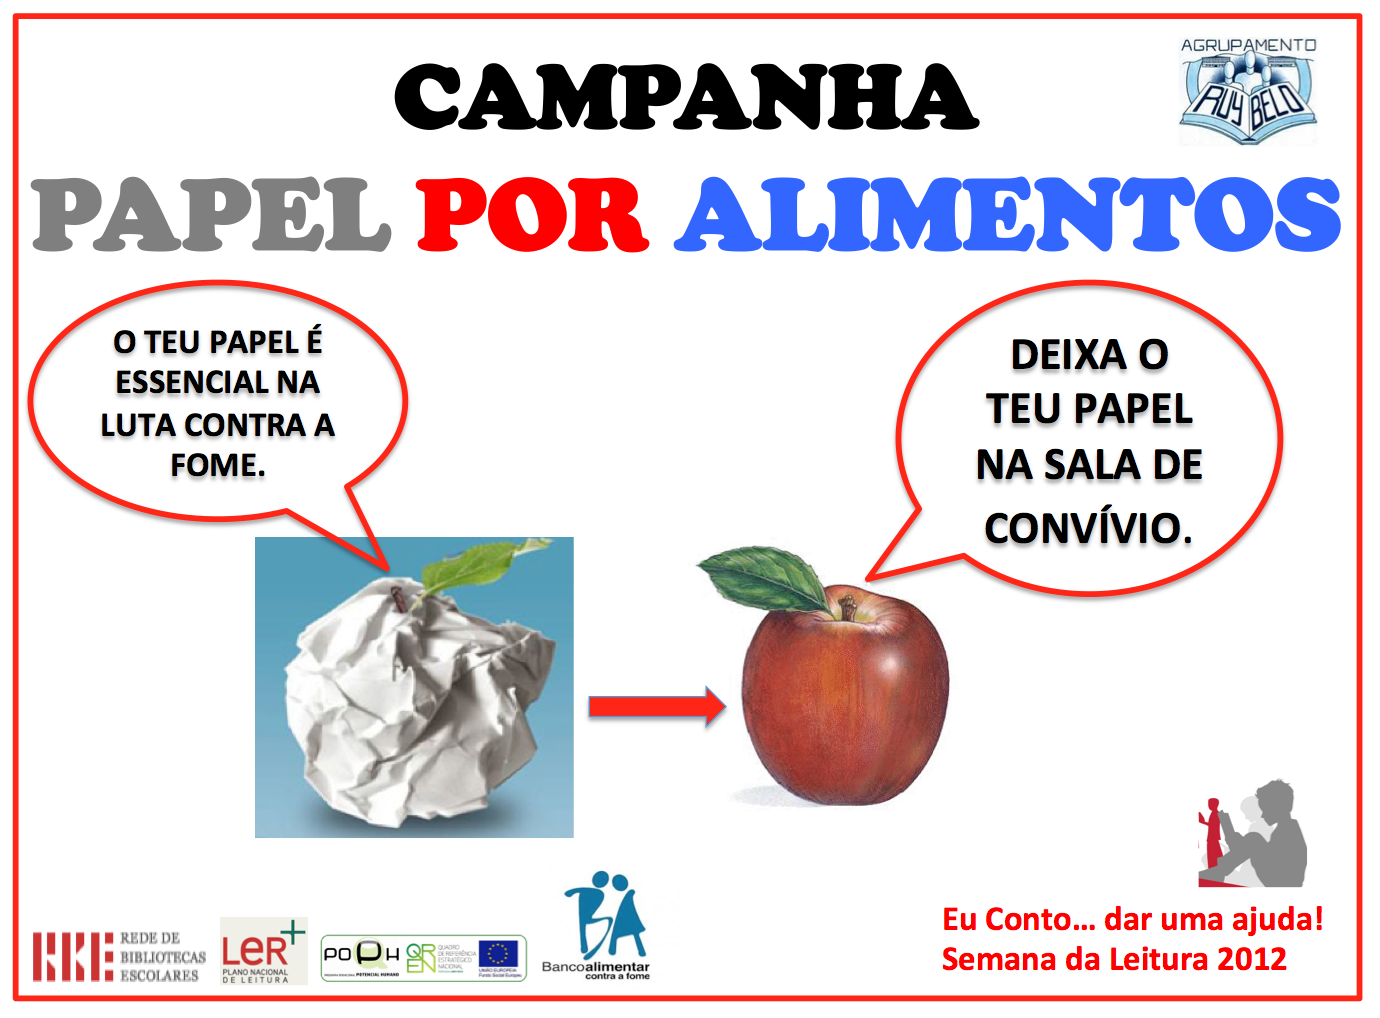 Palavras ao vento bibliotecas agrupamento ruy belo campanha papel por alimentos - Banco de alimentos wikipedia ...